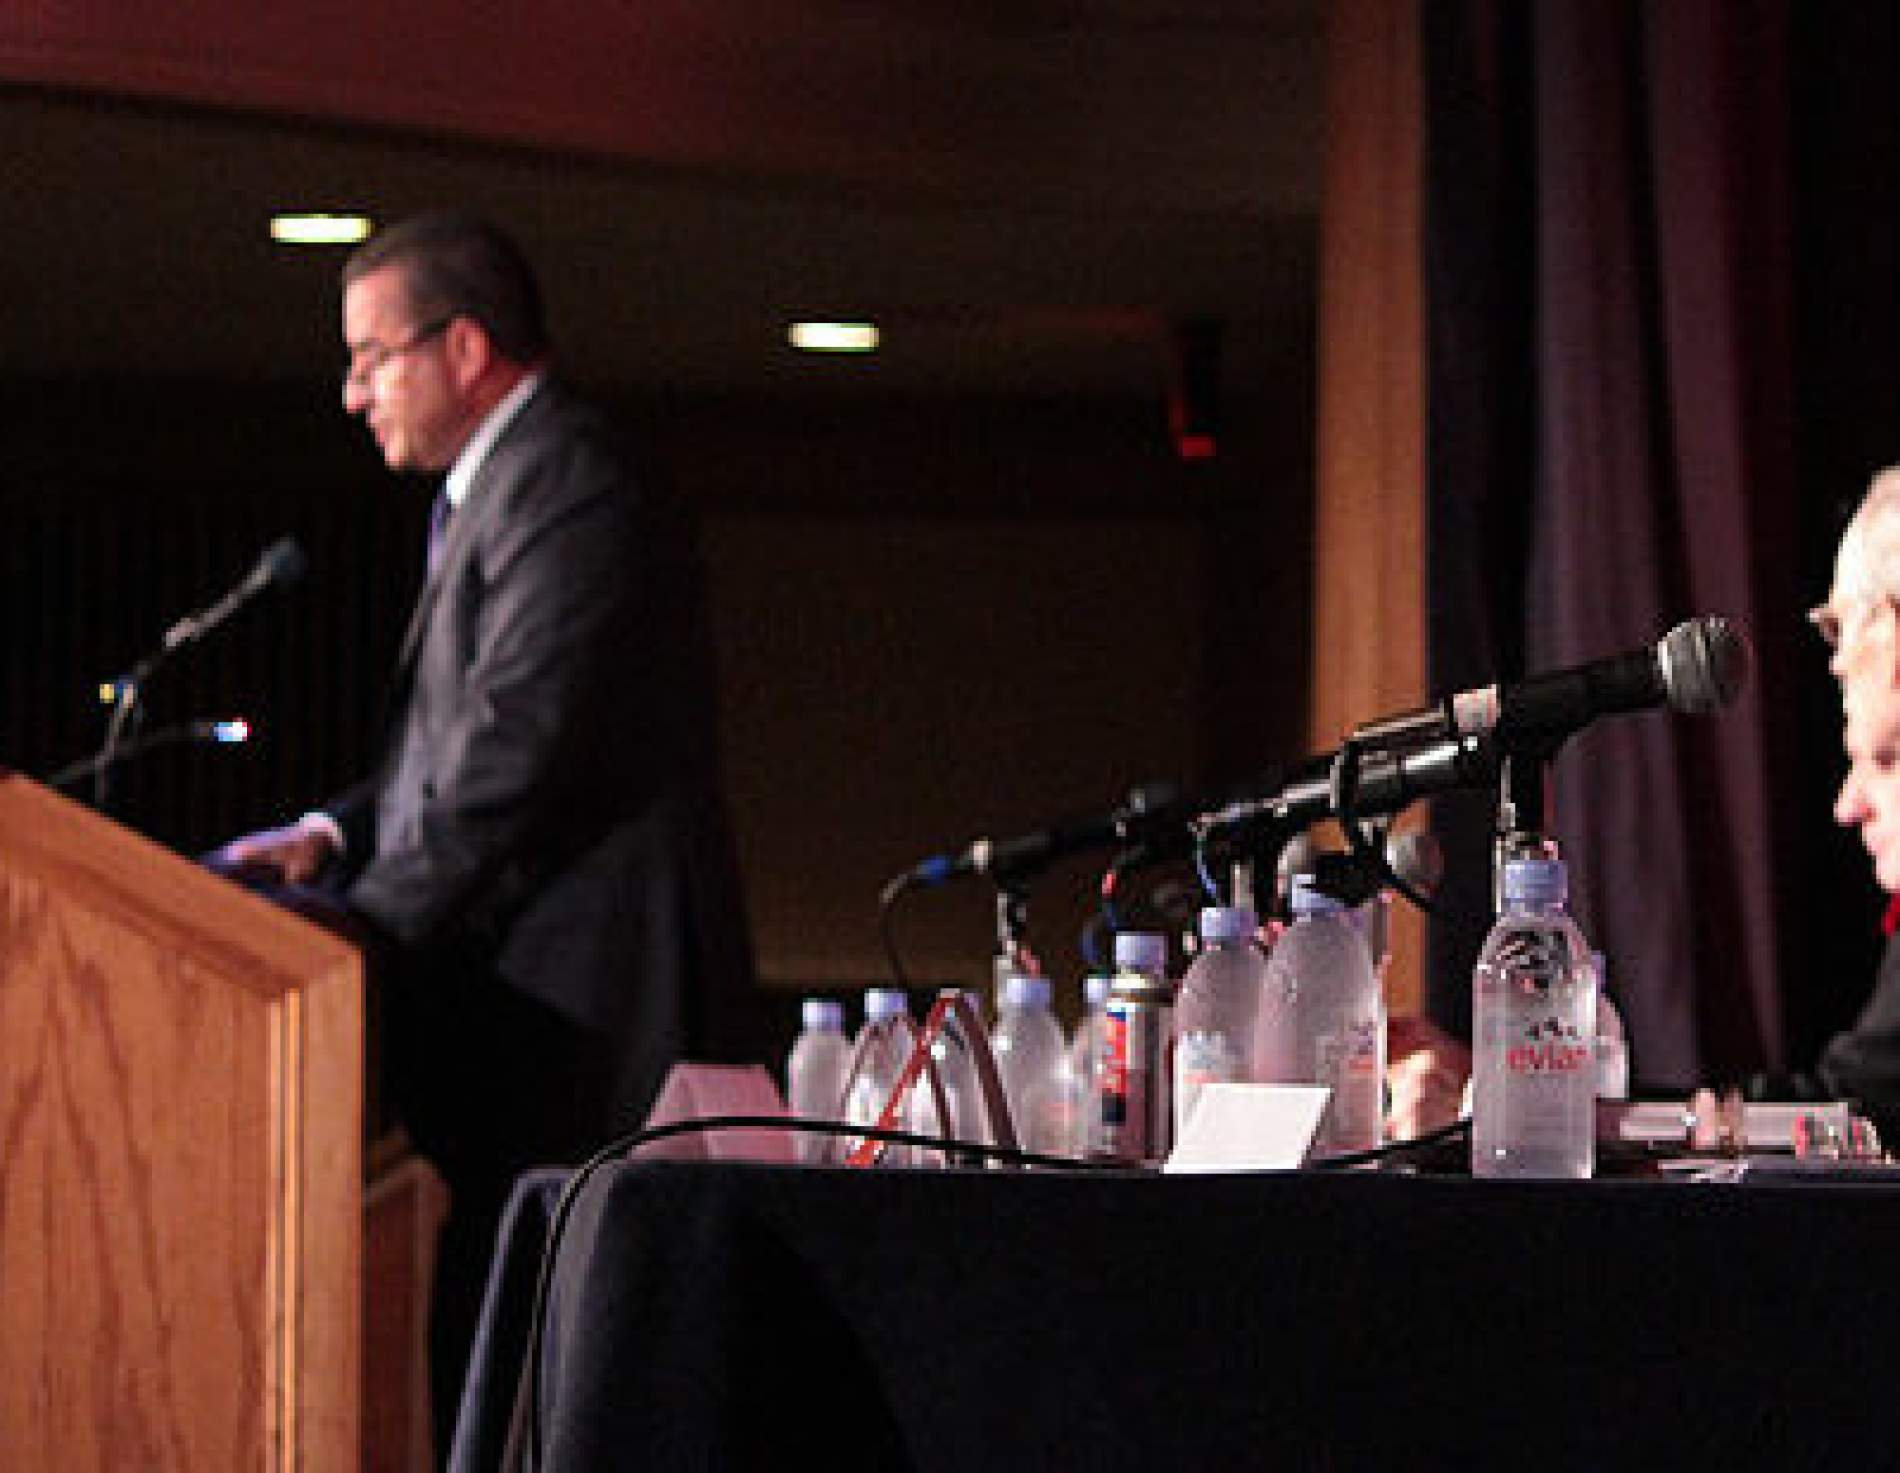 Bob Klonk speaking at a podium